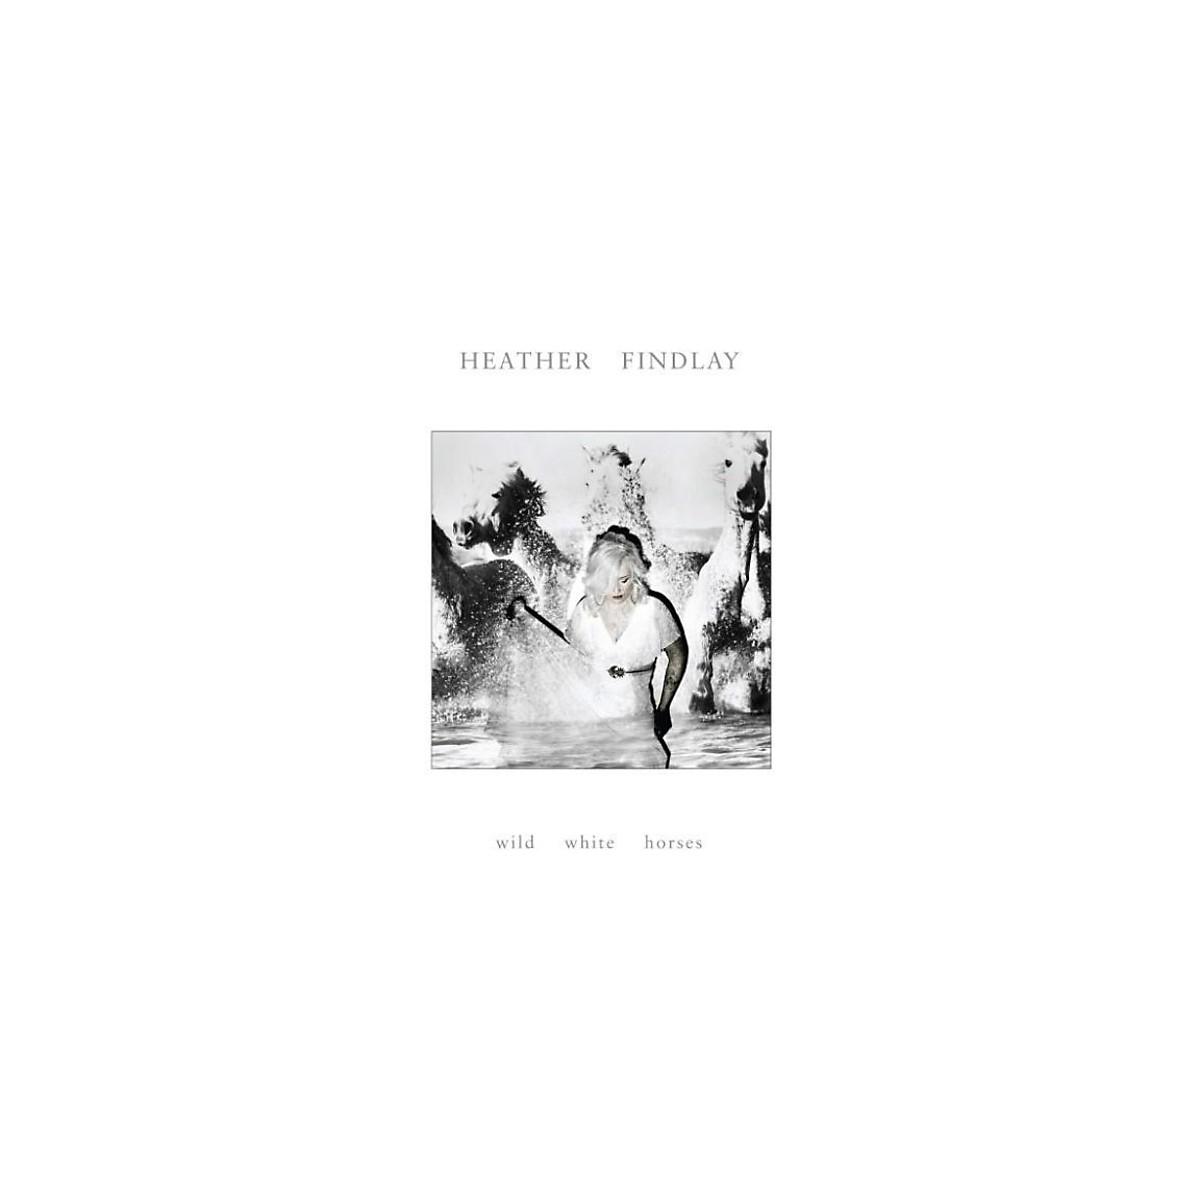 Alliance Heather Findlay - Wild White Horses (180gm White Vinyl)